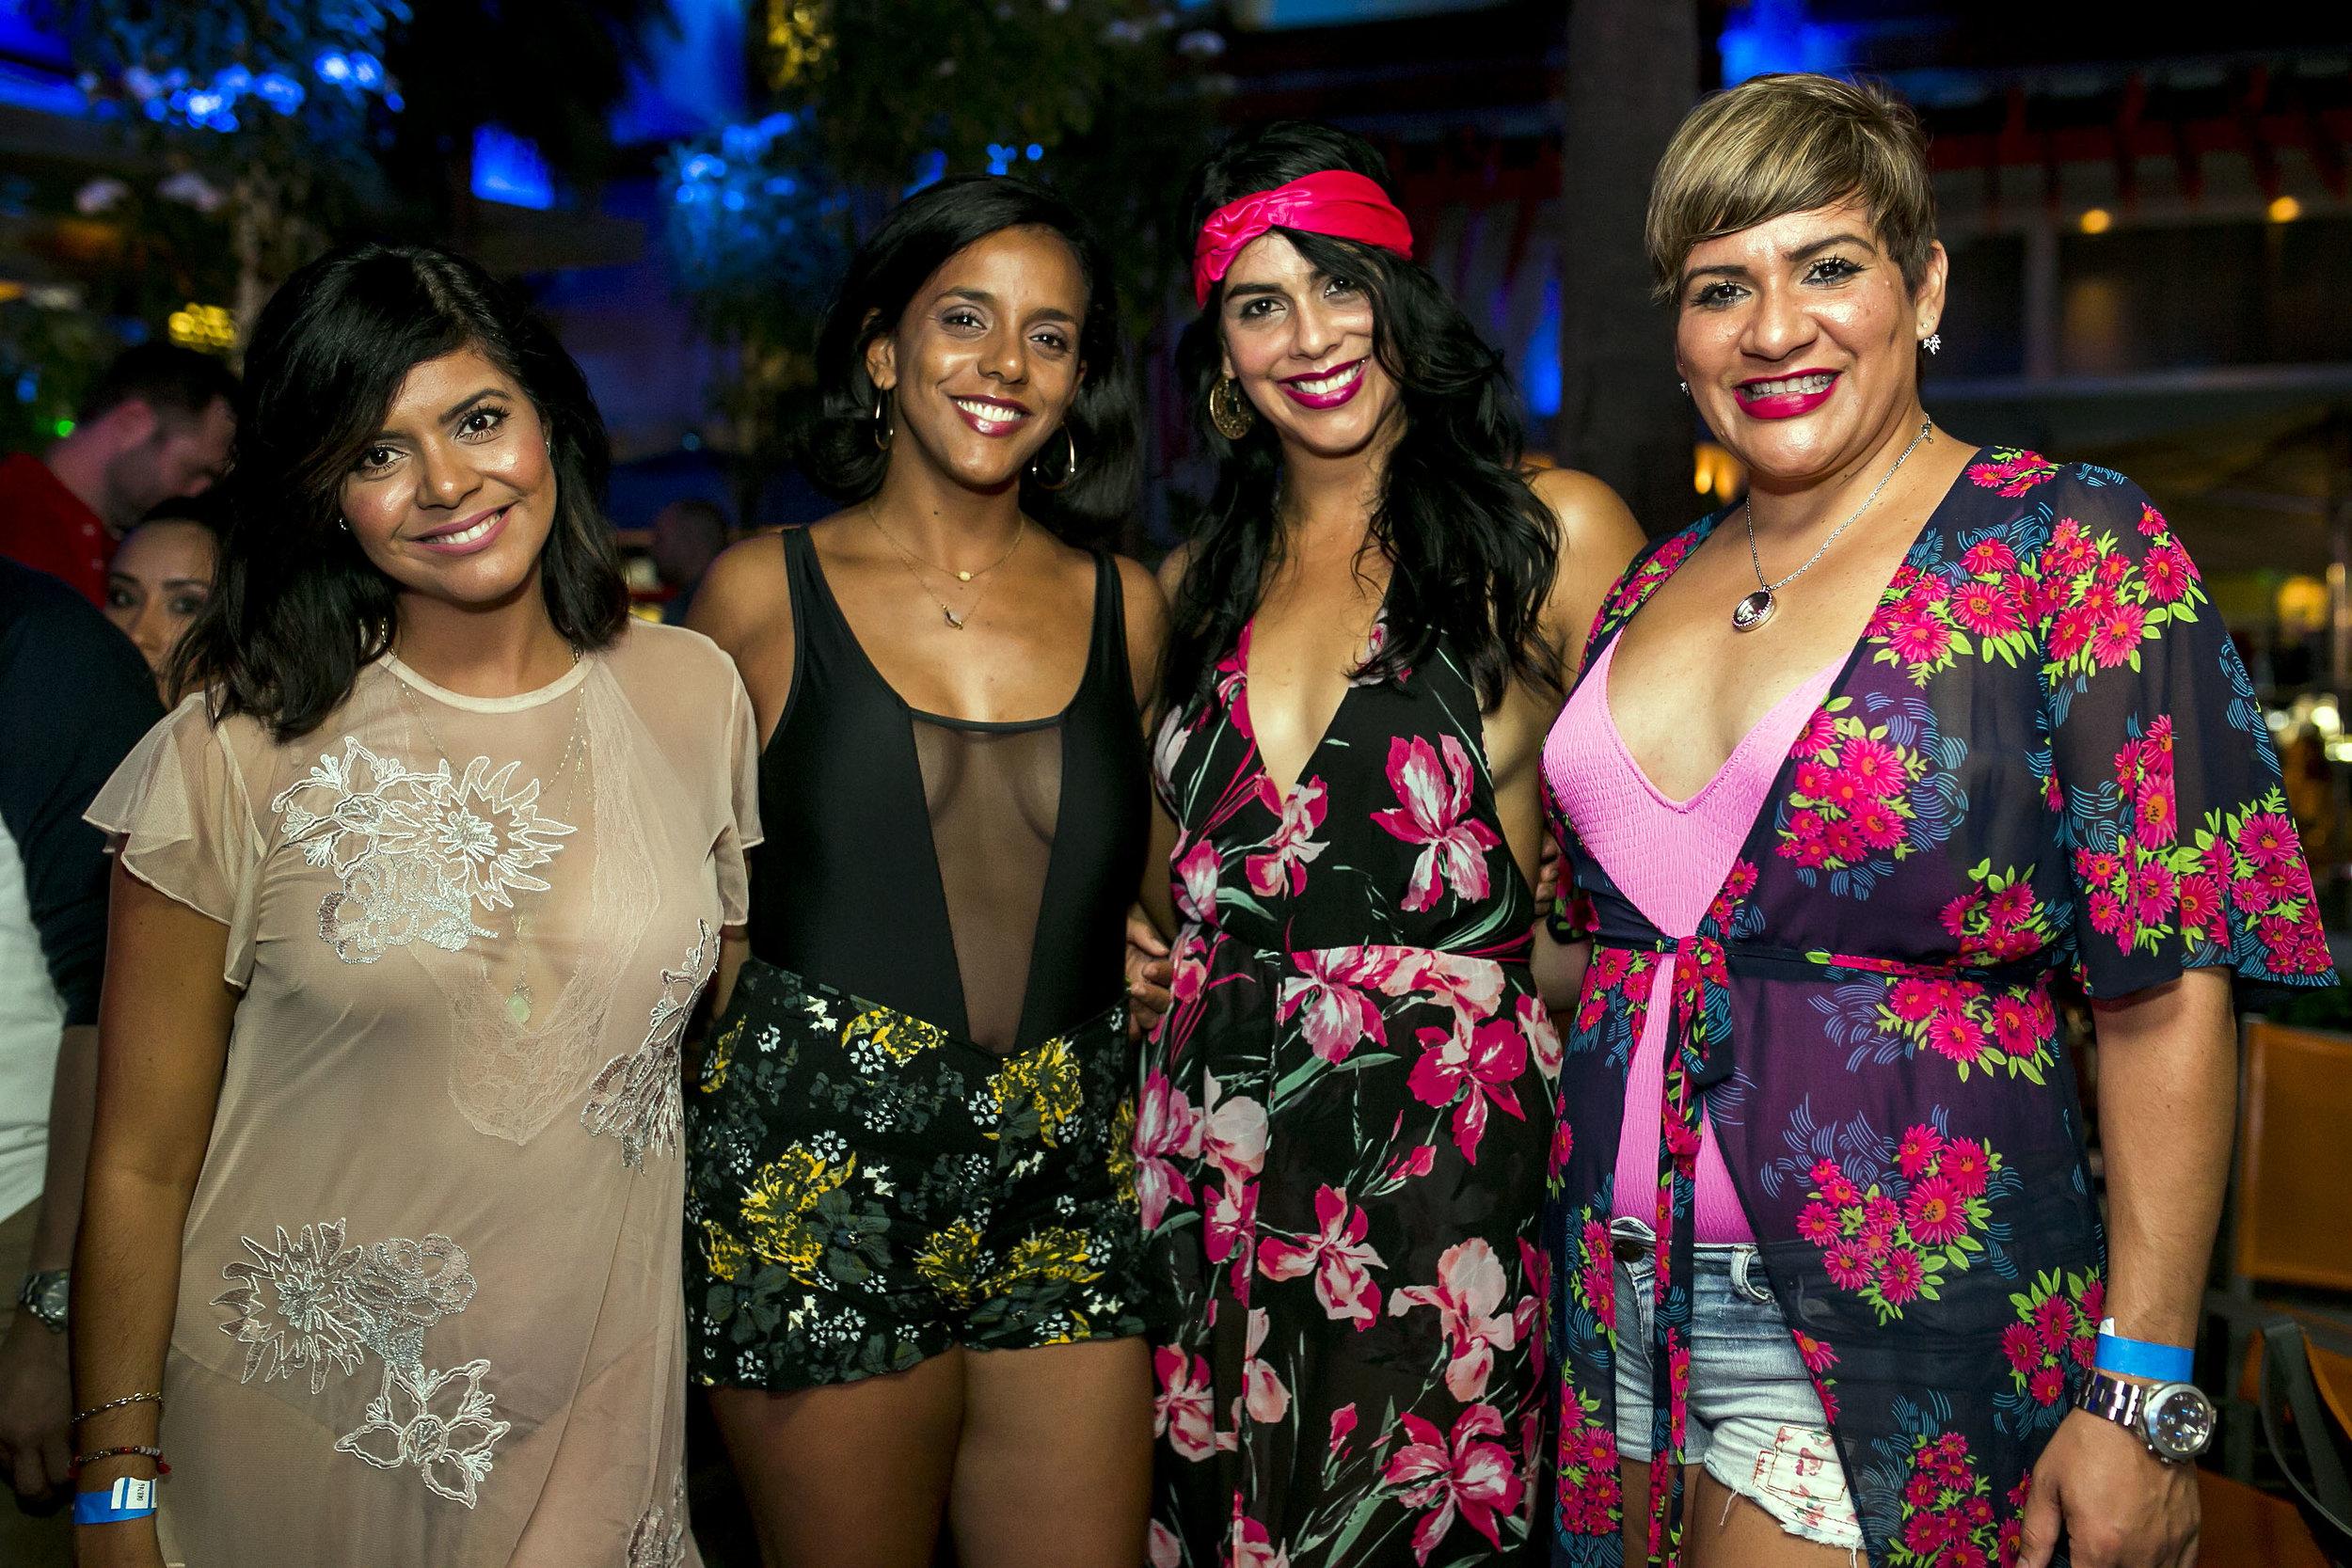 Frances Ruiz, Lucía Maisonet, Lydia Reyes y Aleysa Ruiz.JPG